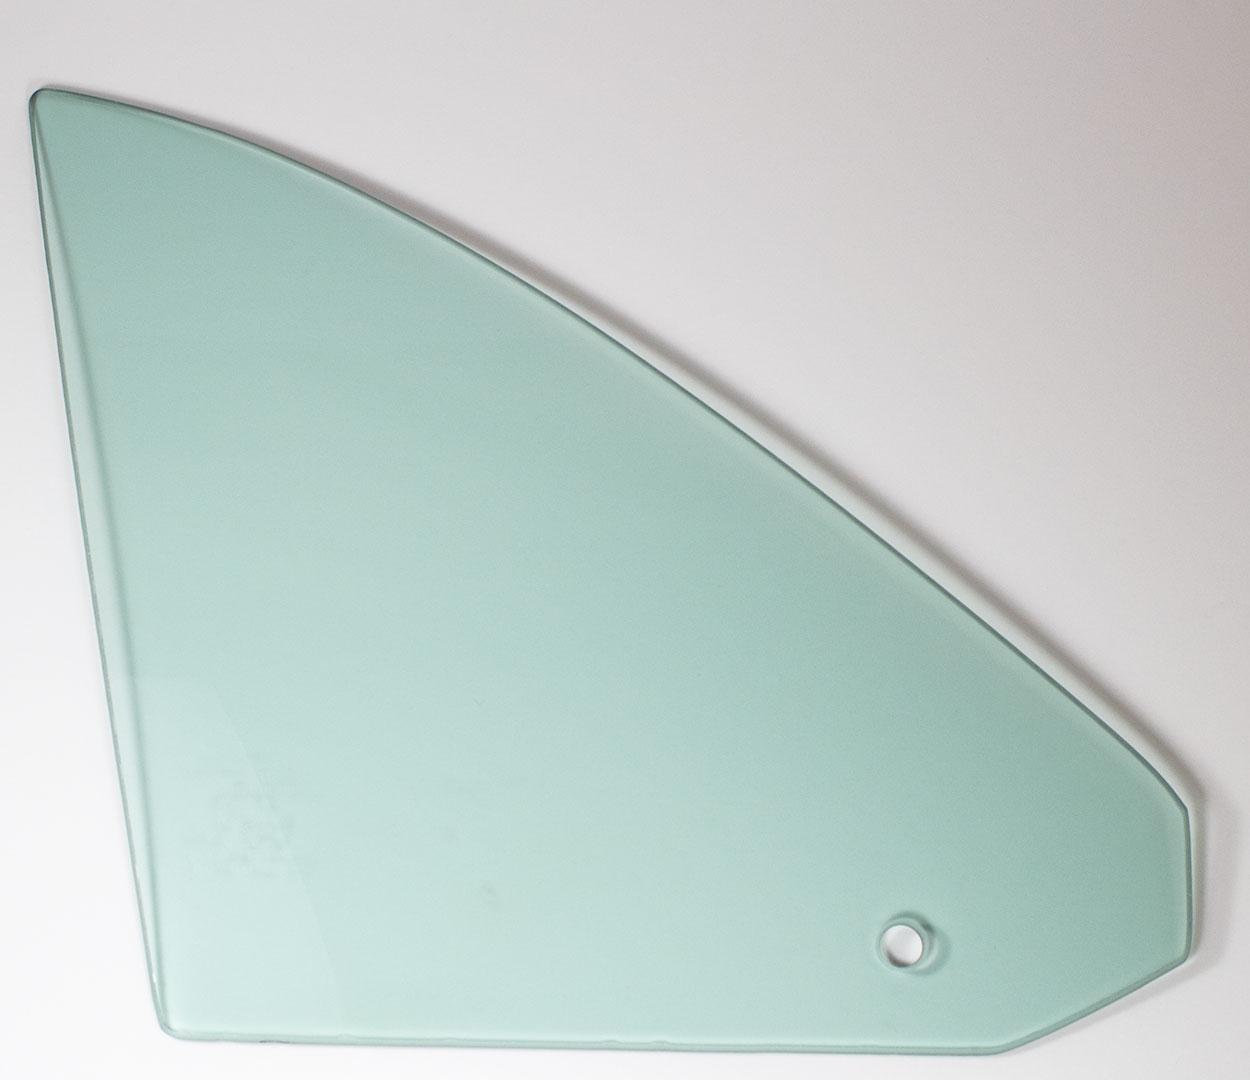 70-74 Dodge Challenger Quarter Glass Left Tint Hardtop